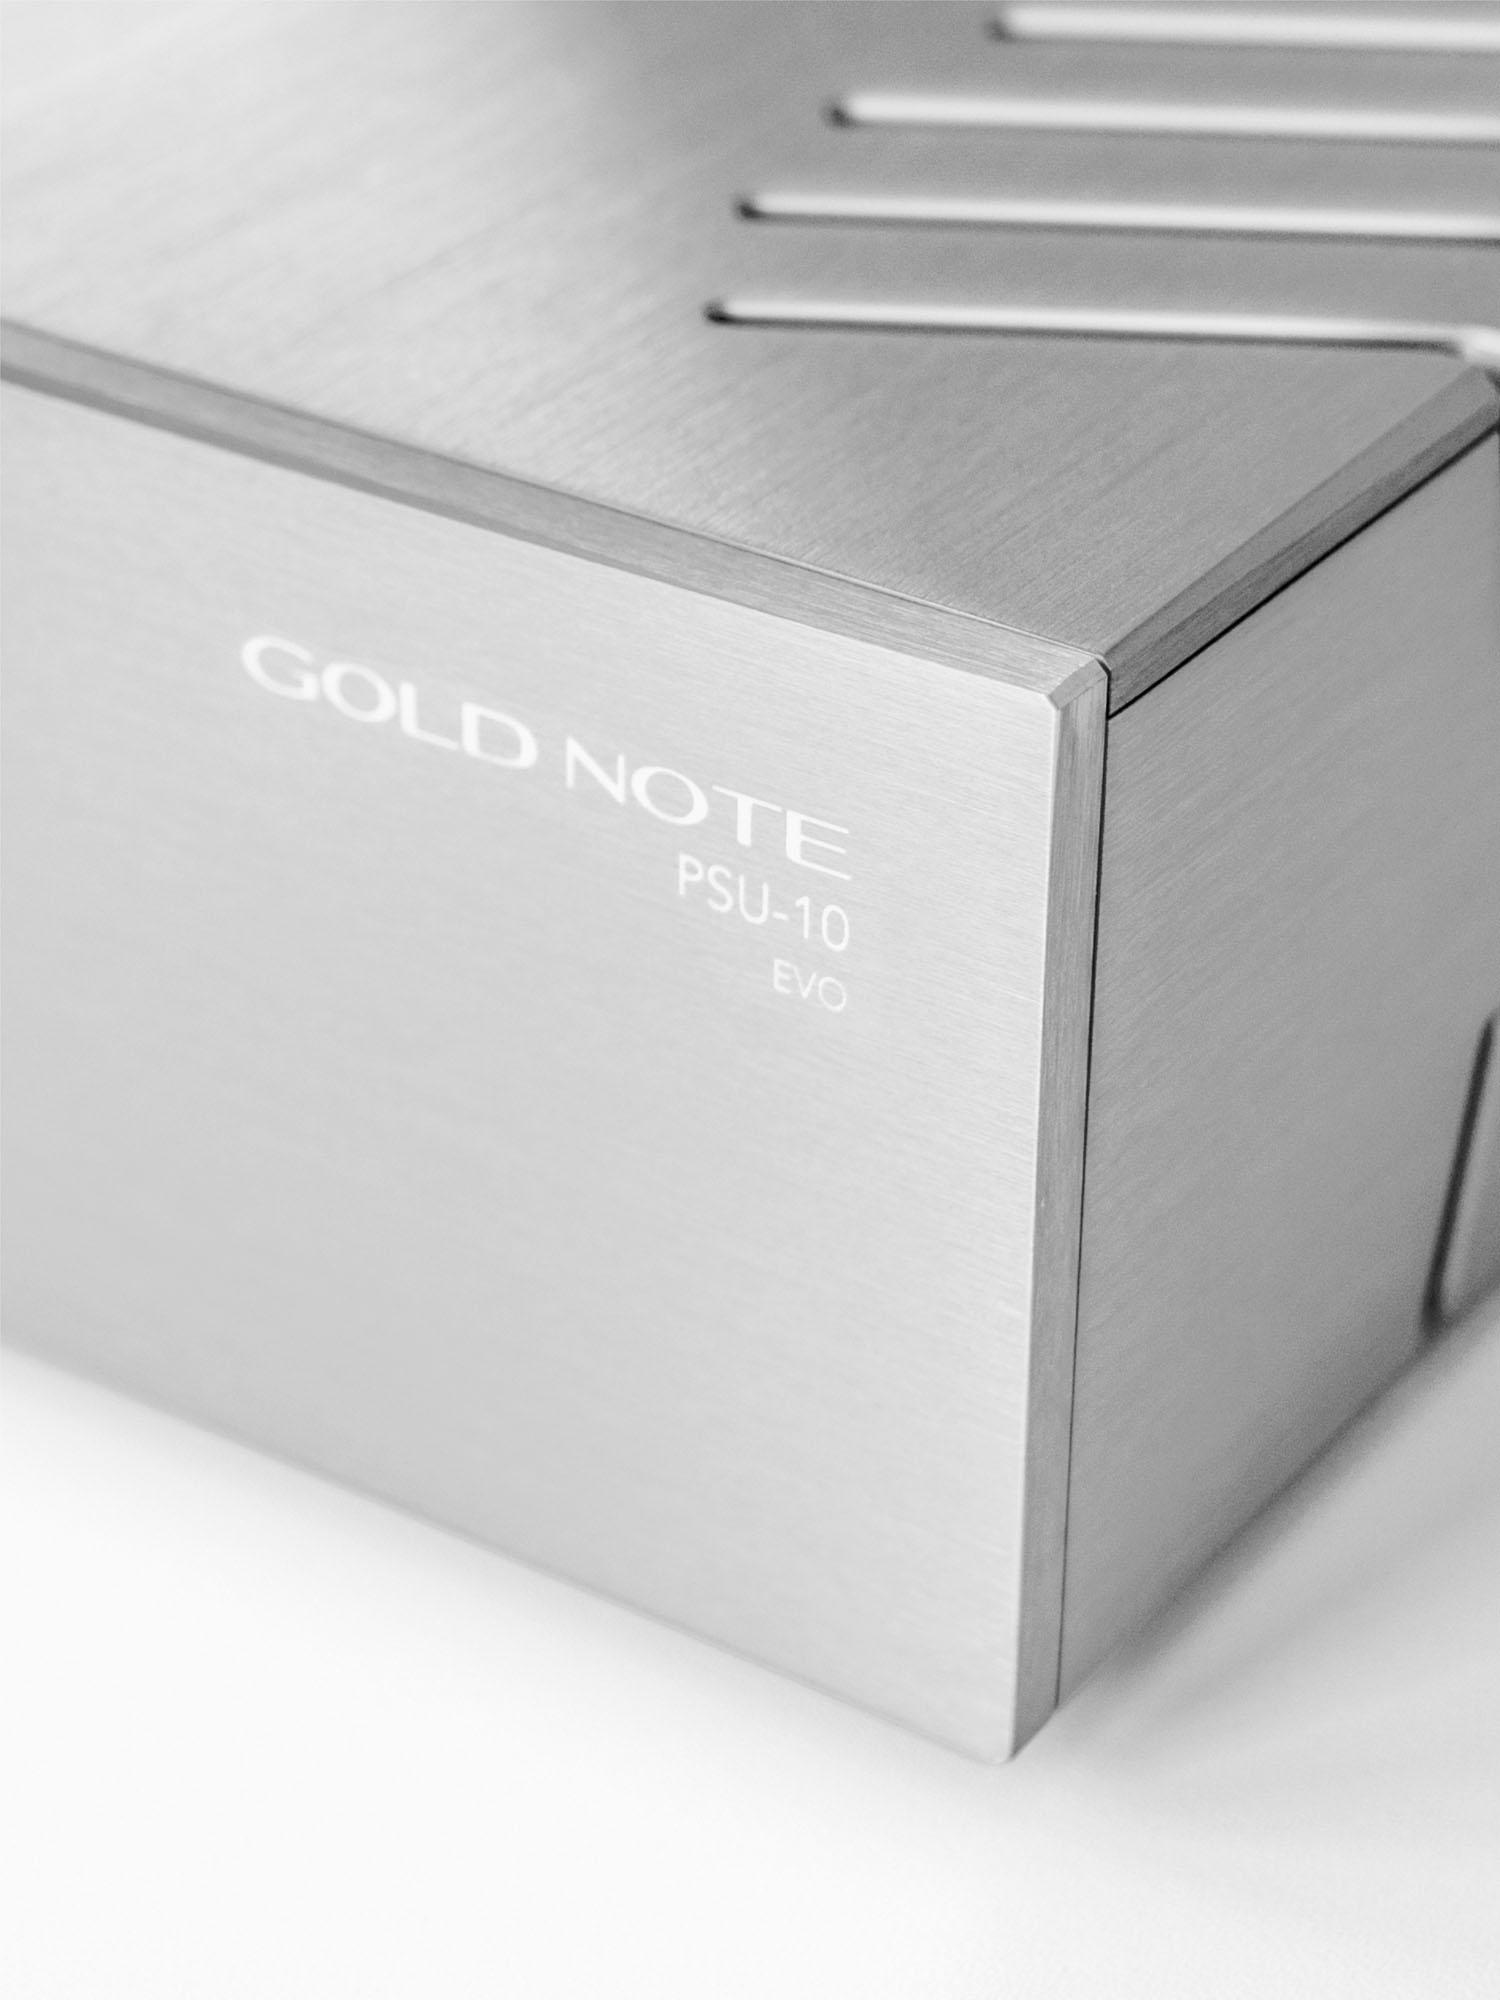 Gold Note PSU-10 Evo Power Supply